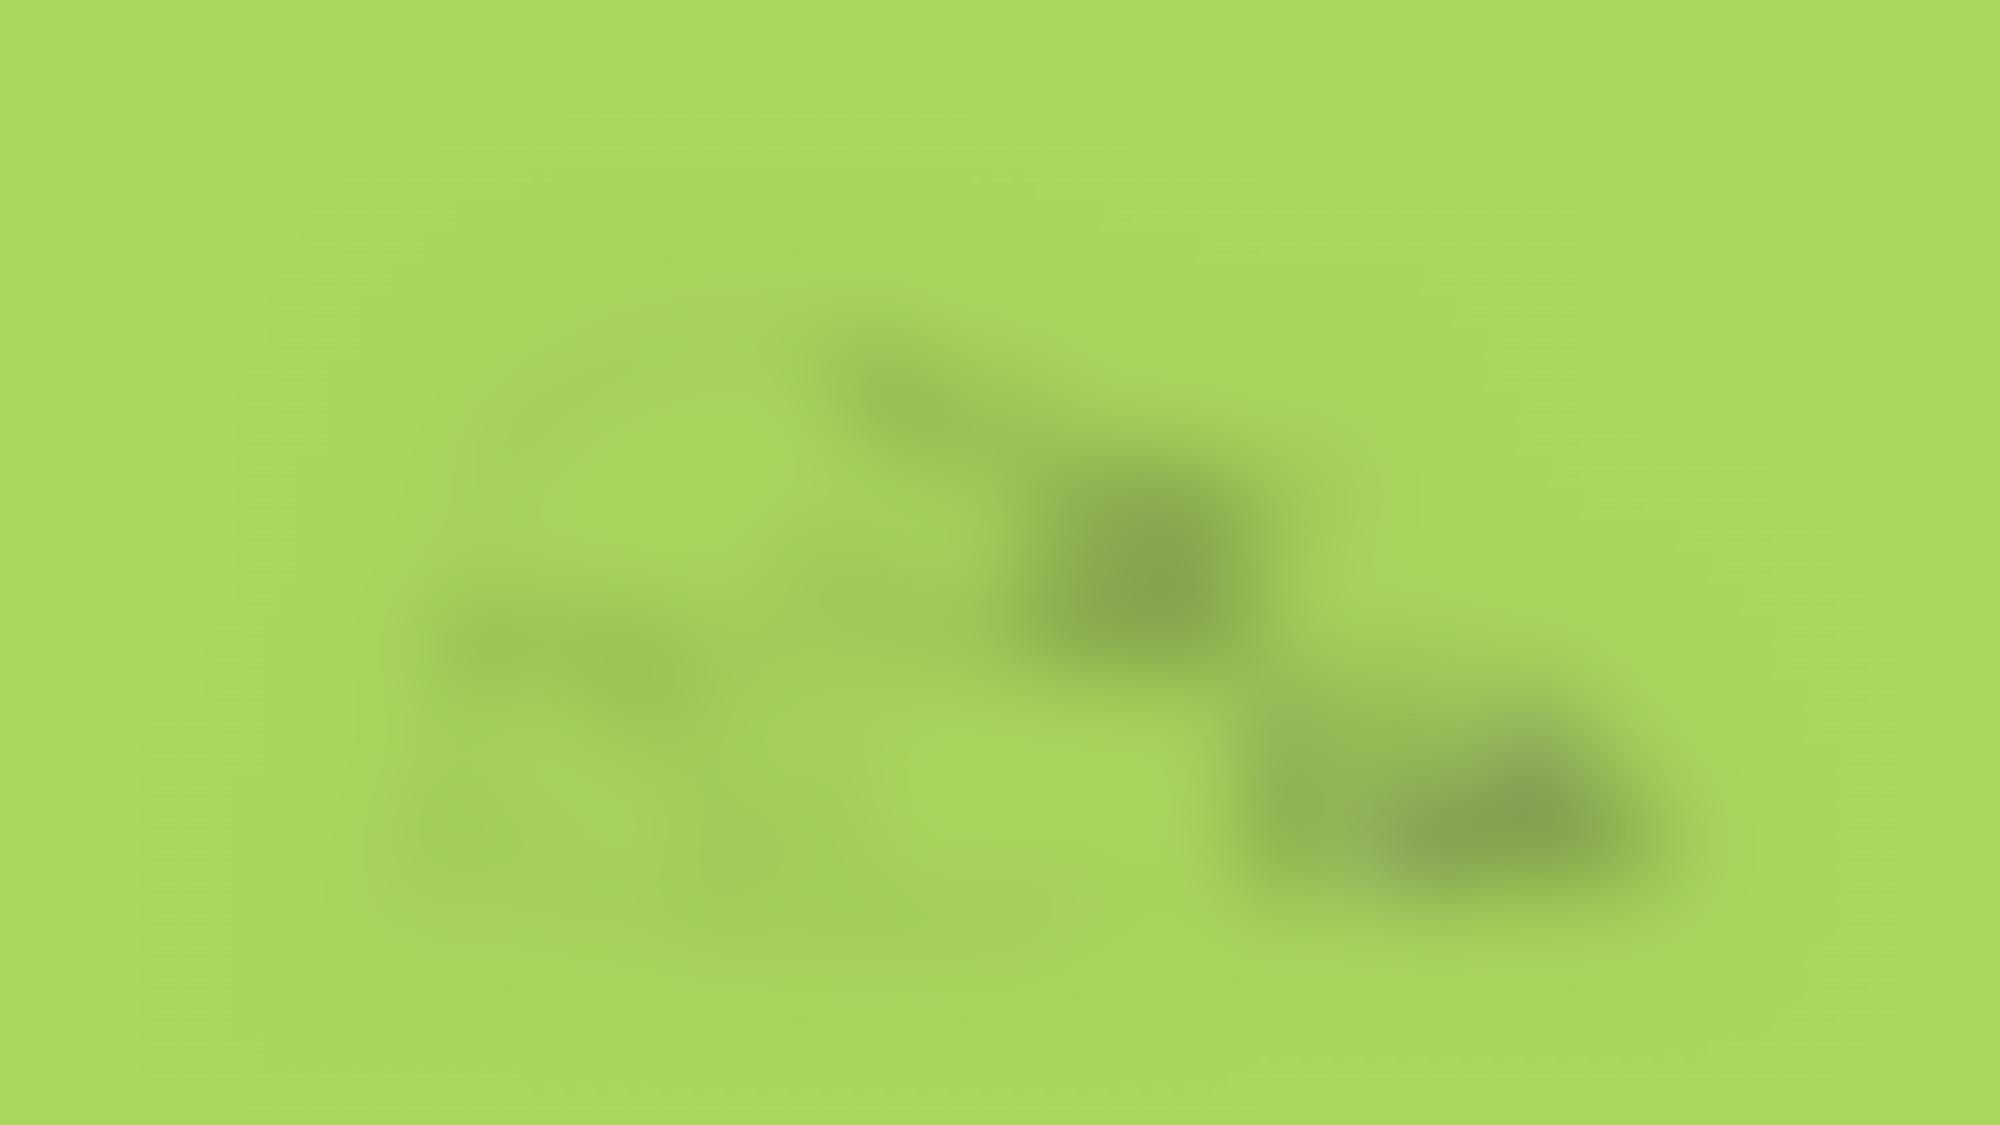 Story Concepts autocompressfitresizeixlibphp 1 1 0max h2000max w3 D2000q80sd511277c1ac4f8e22a7f47c79b3ea763